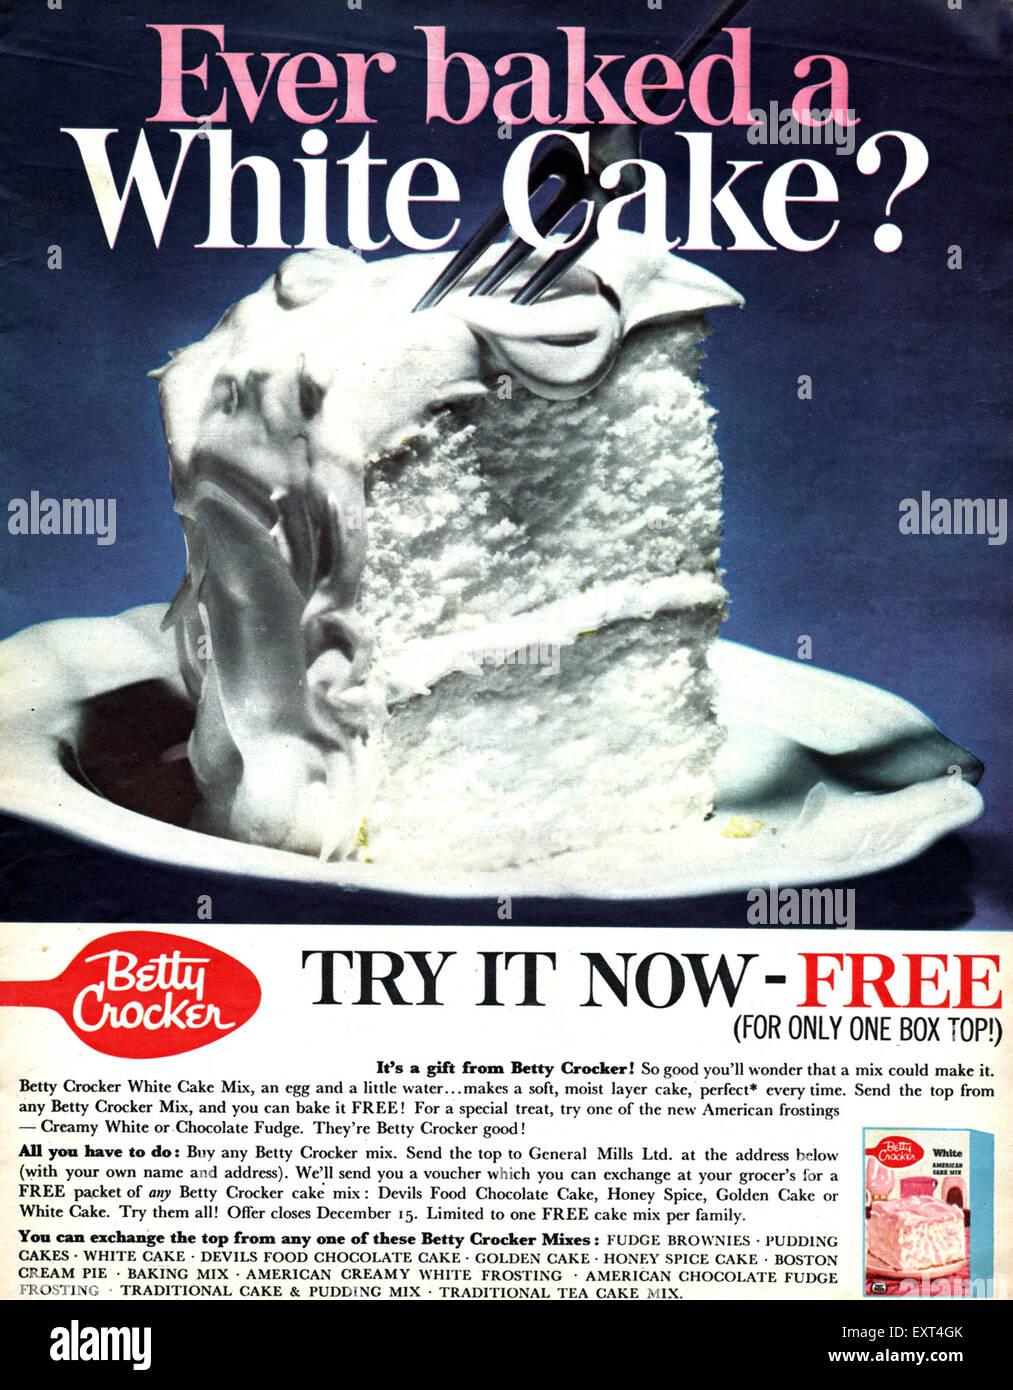 1960s UK Betty Crocker Magazine Advert - Stock Image